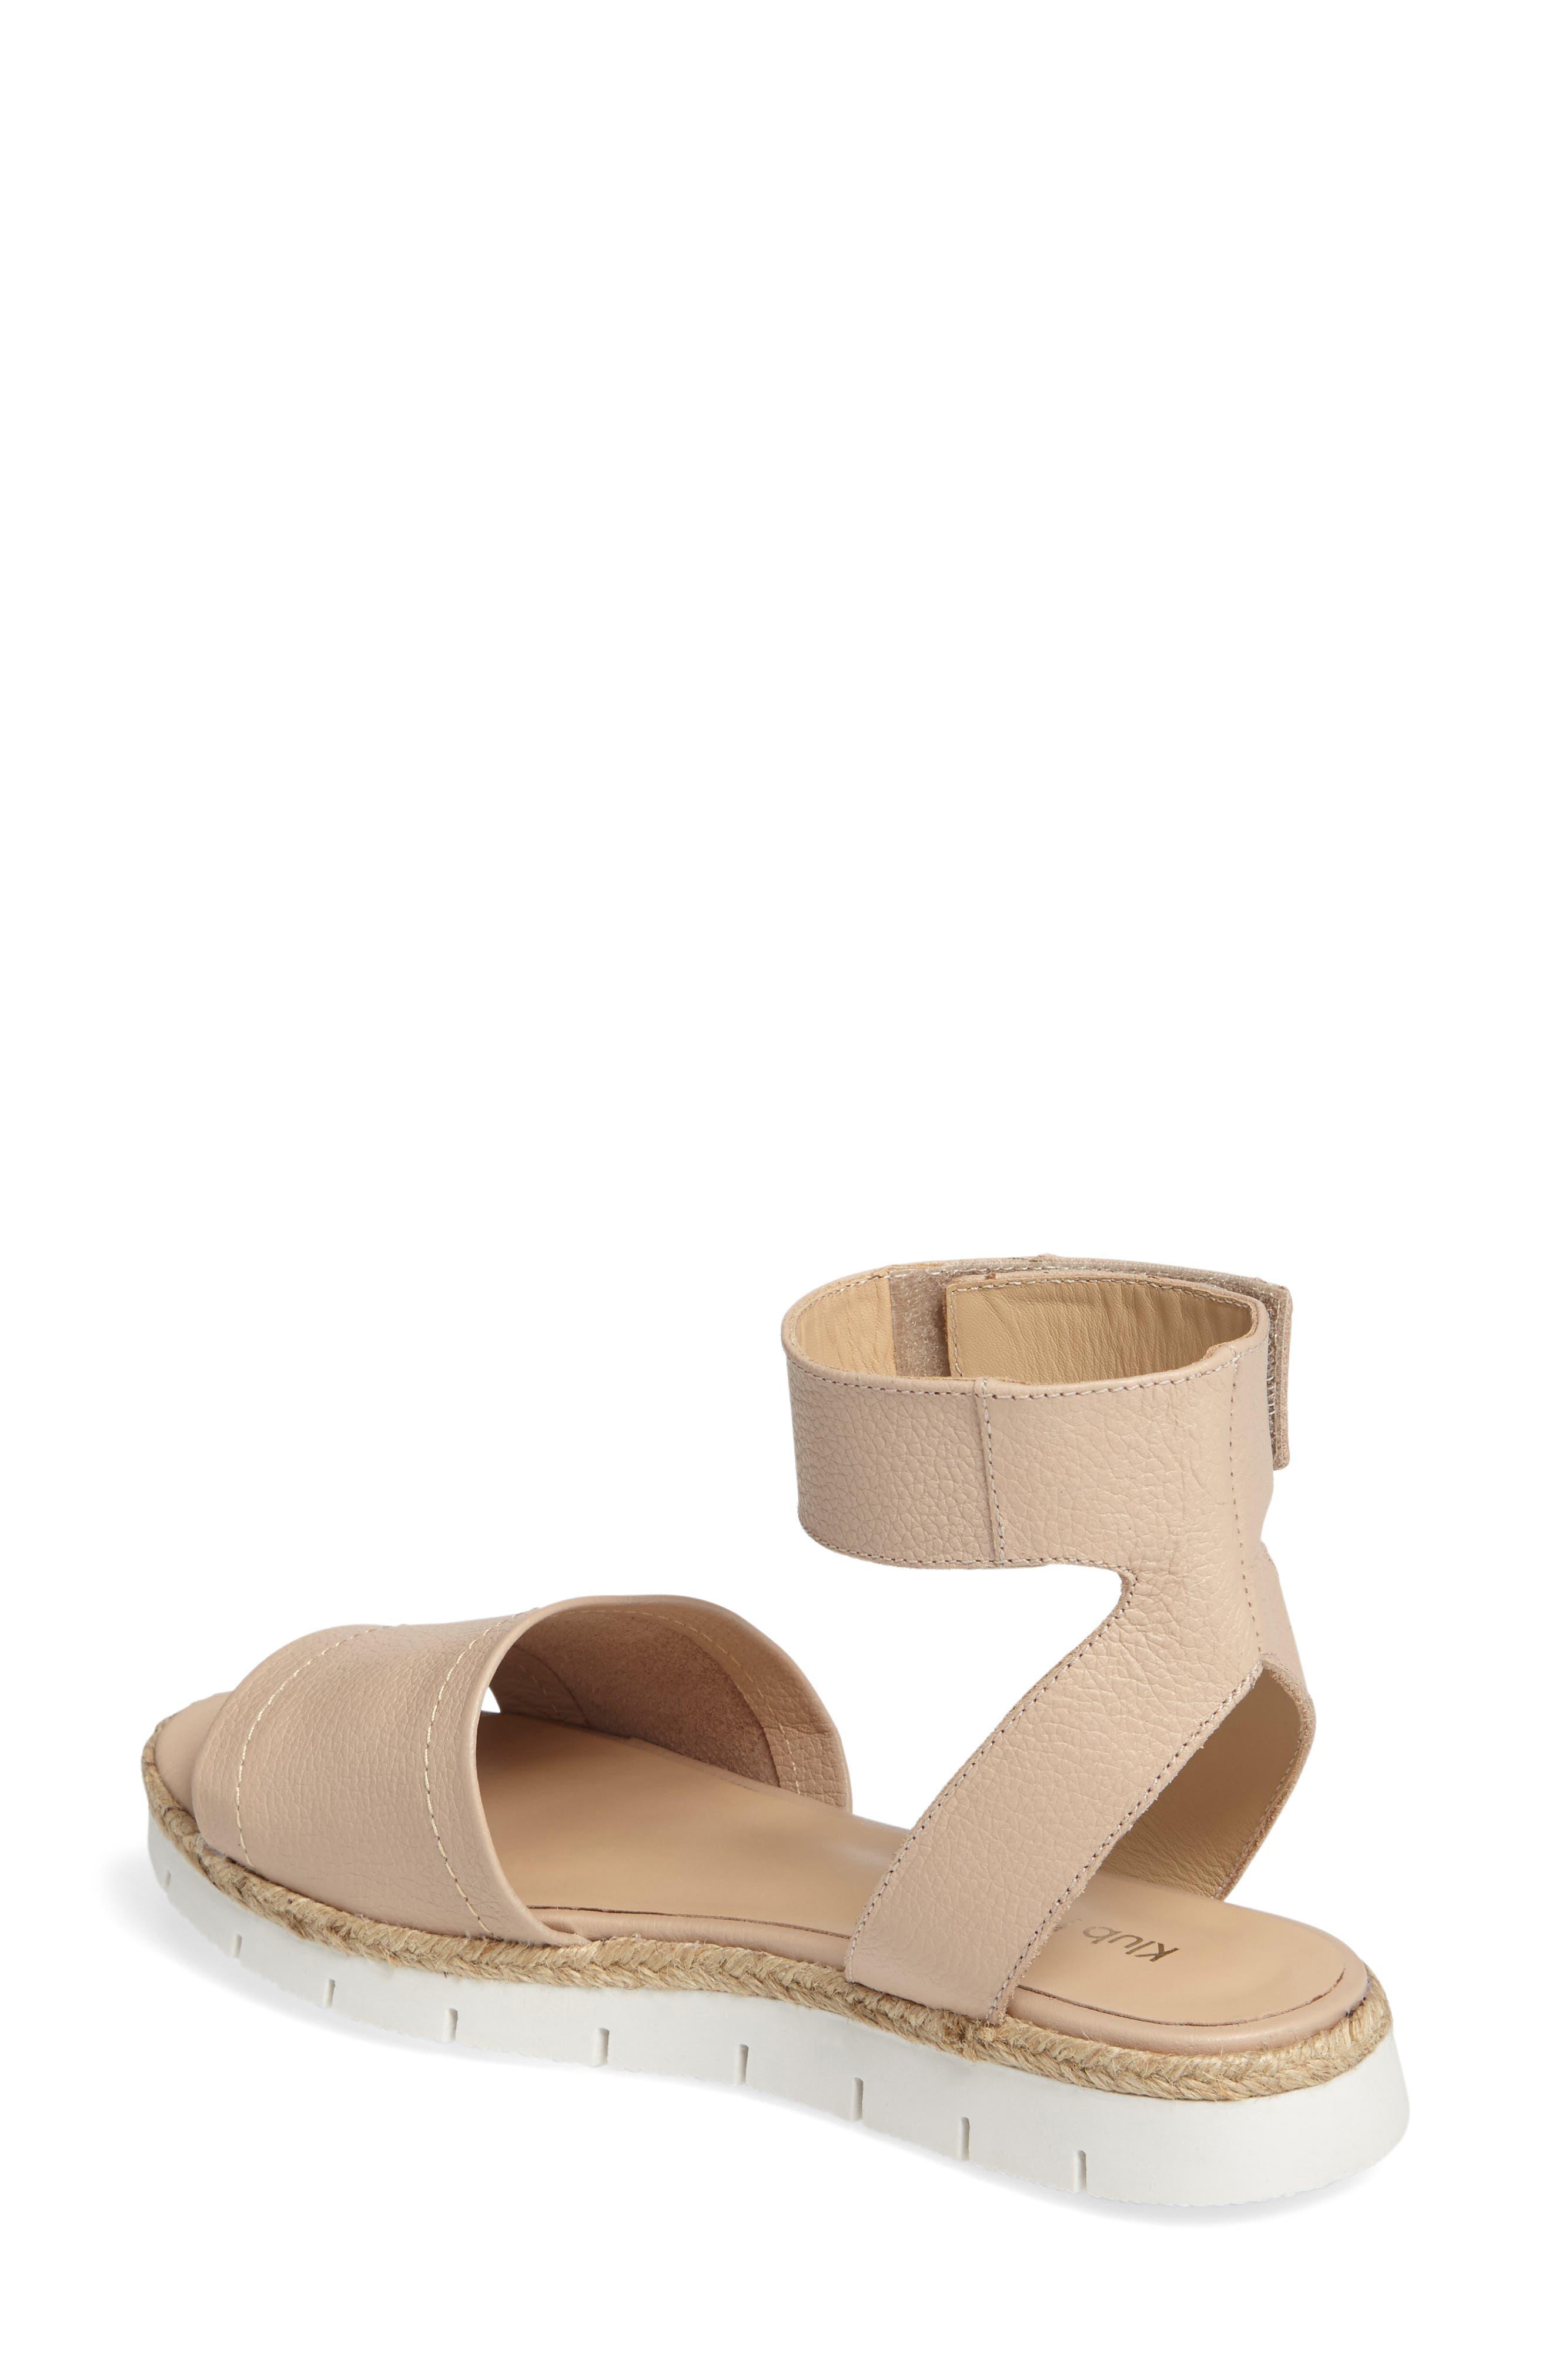 Cleo Platform Sandal,                             Alternate thumbnail 8, color,